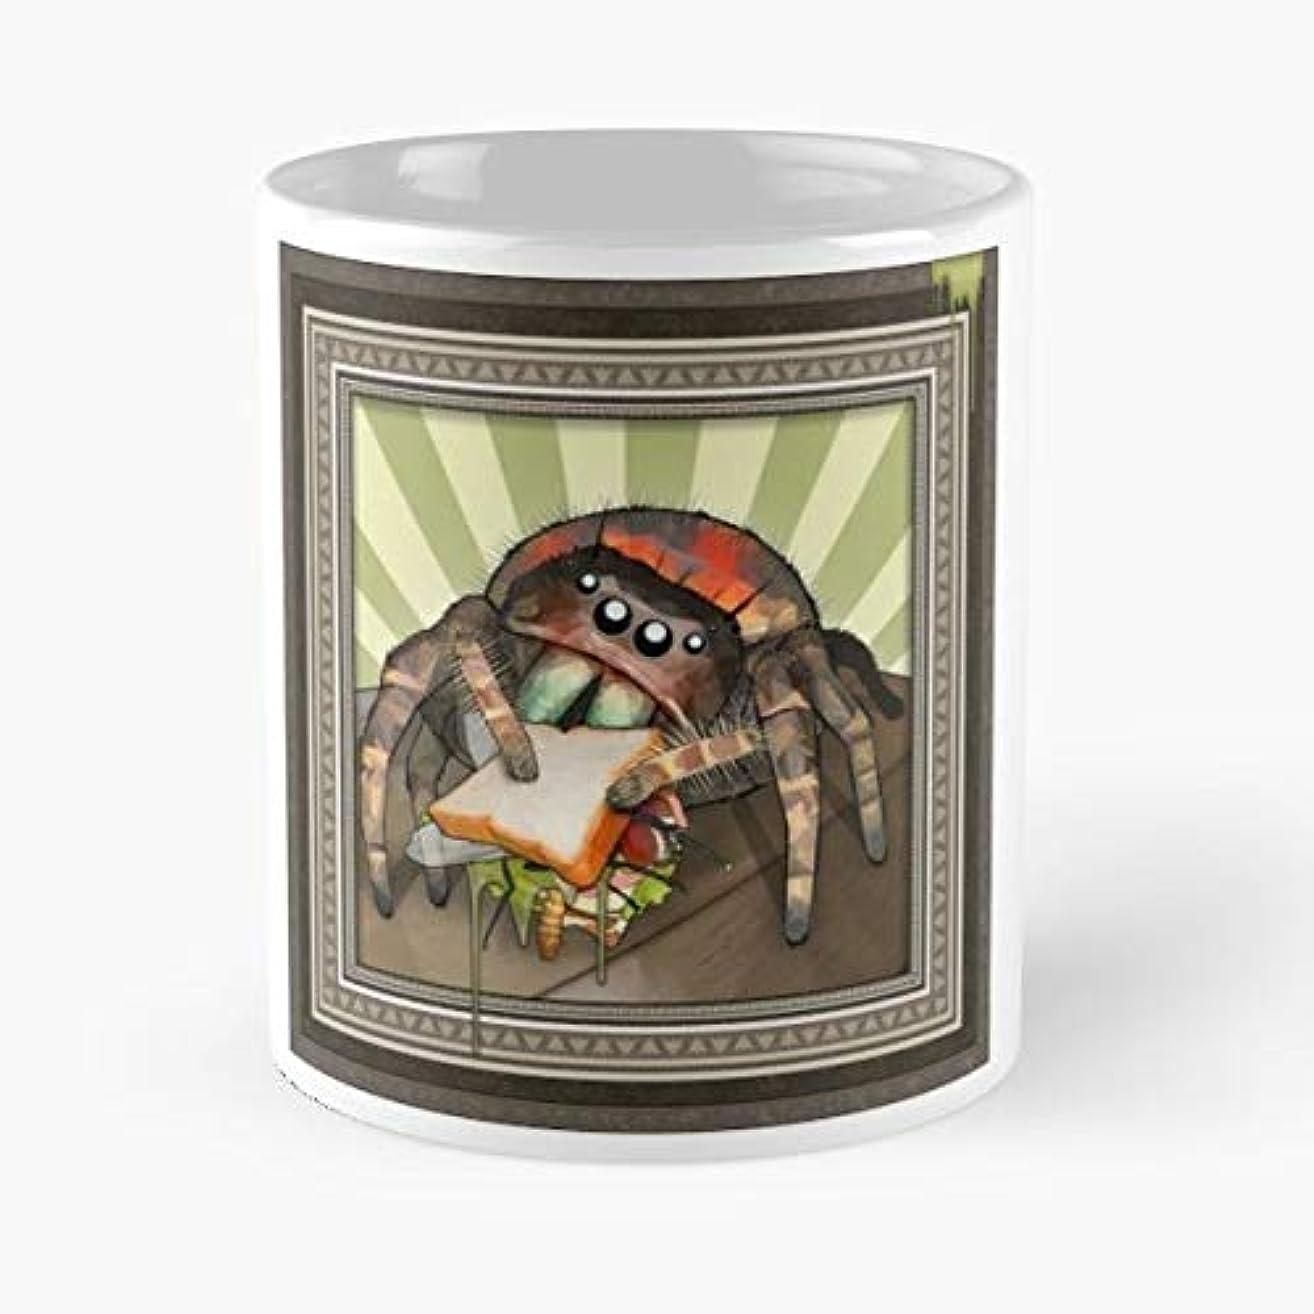 Spider Spiders Jumping Jumper - Handmade Funny 11oz Mug Best Holidays Gifts For Men Women Friends.